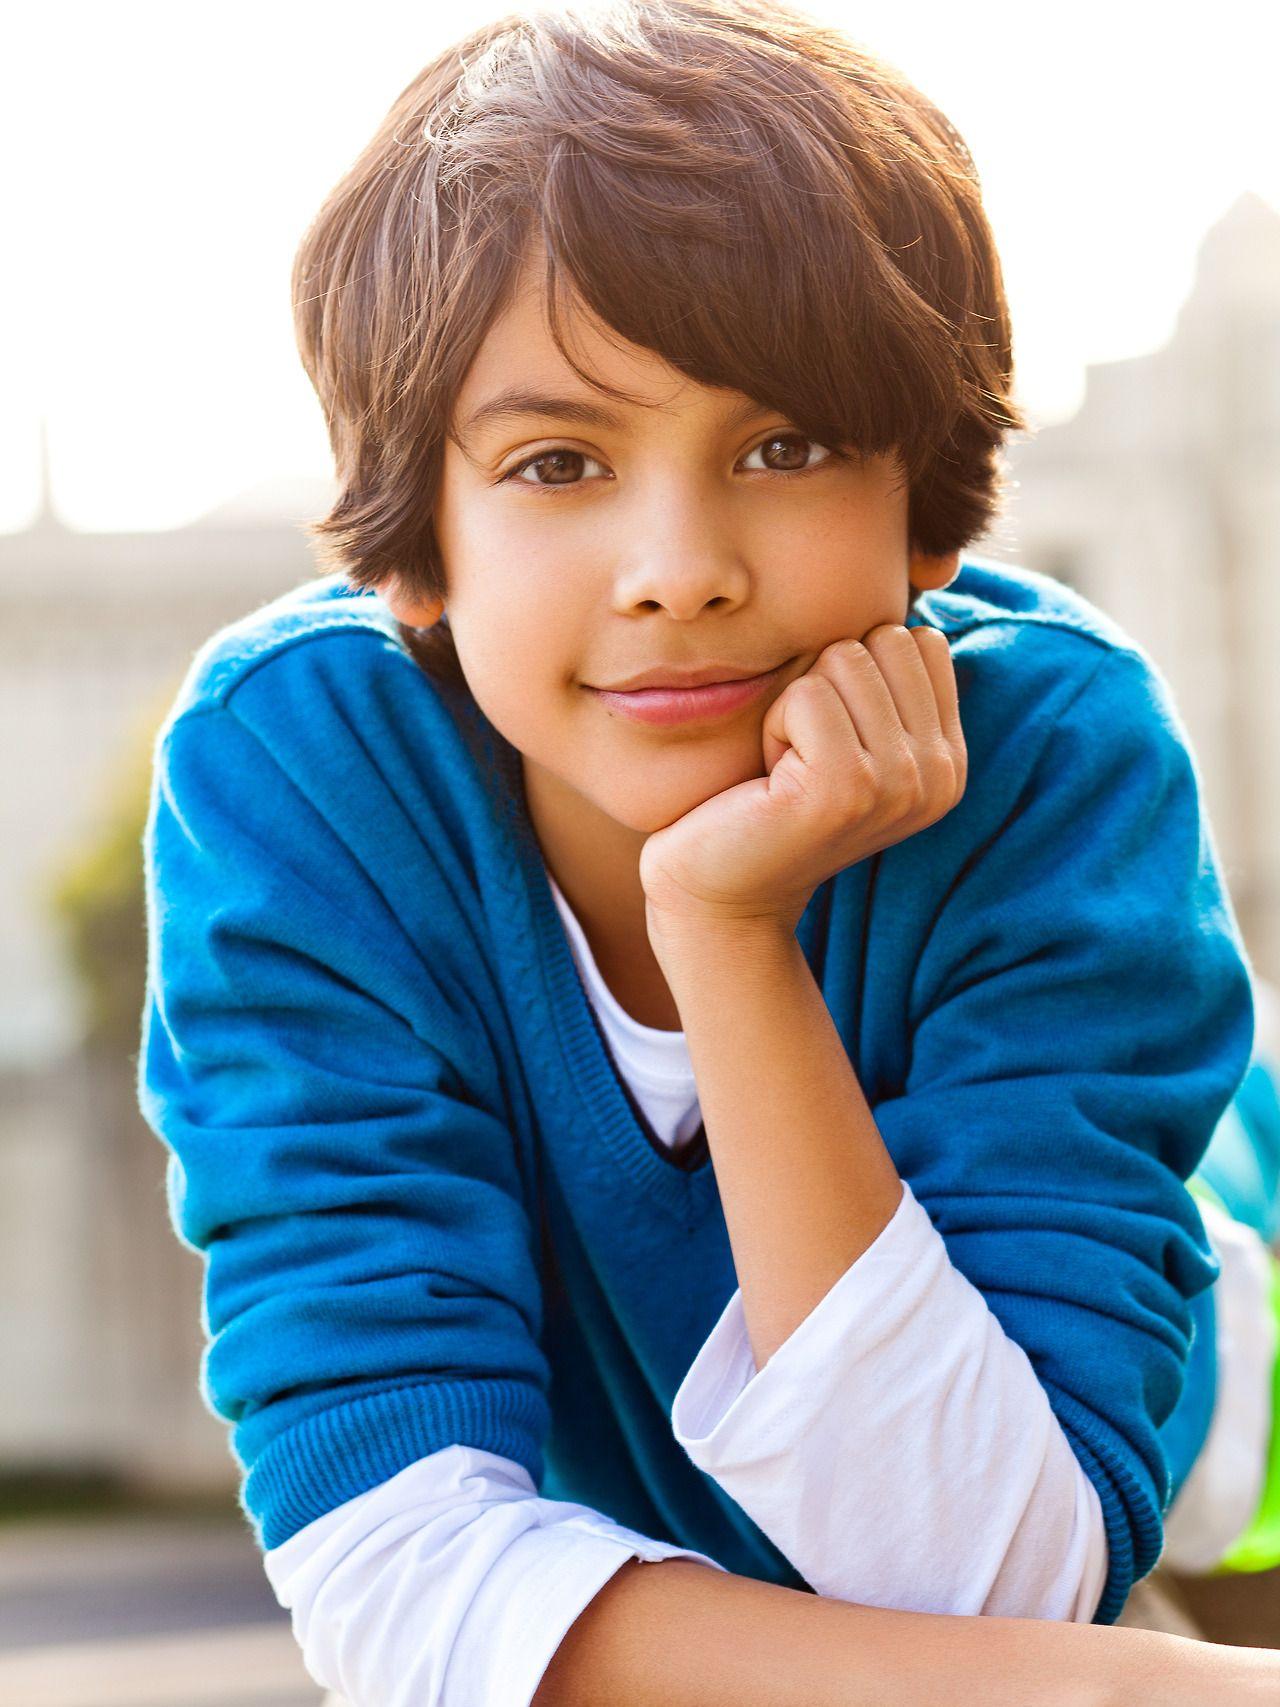 Pin by jarmila vereski on detiČky pinterest boy hair haircuts